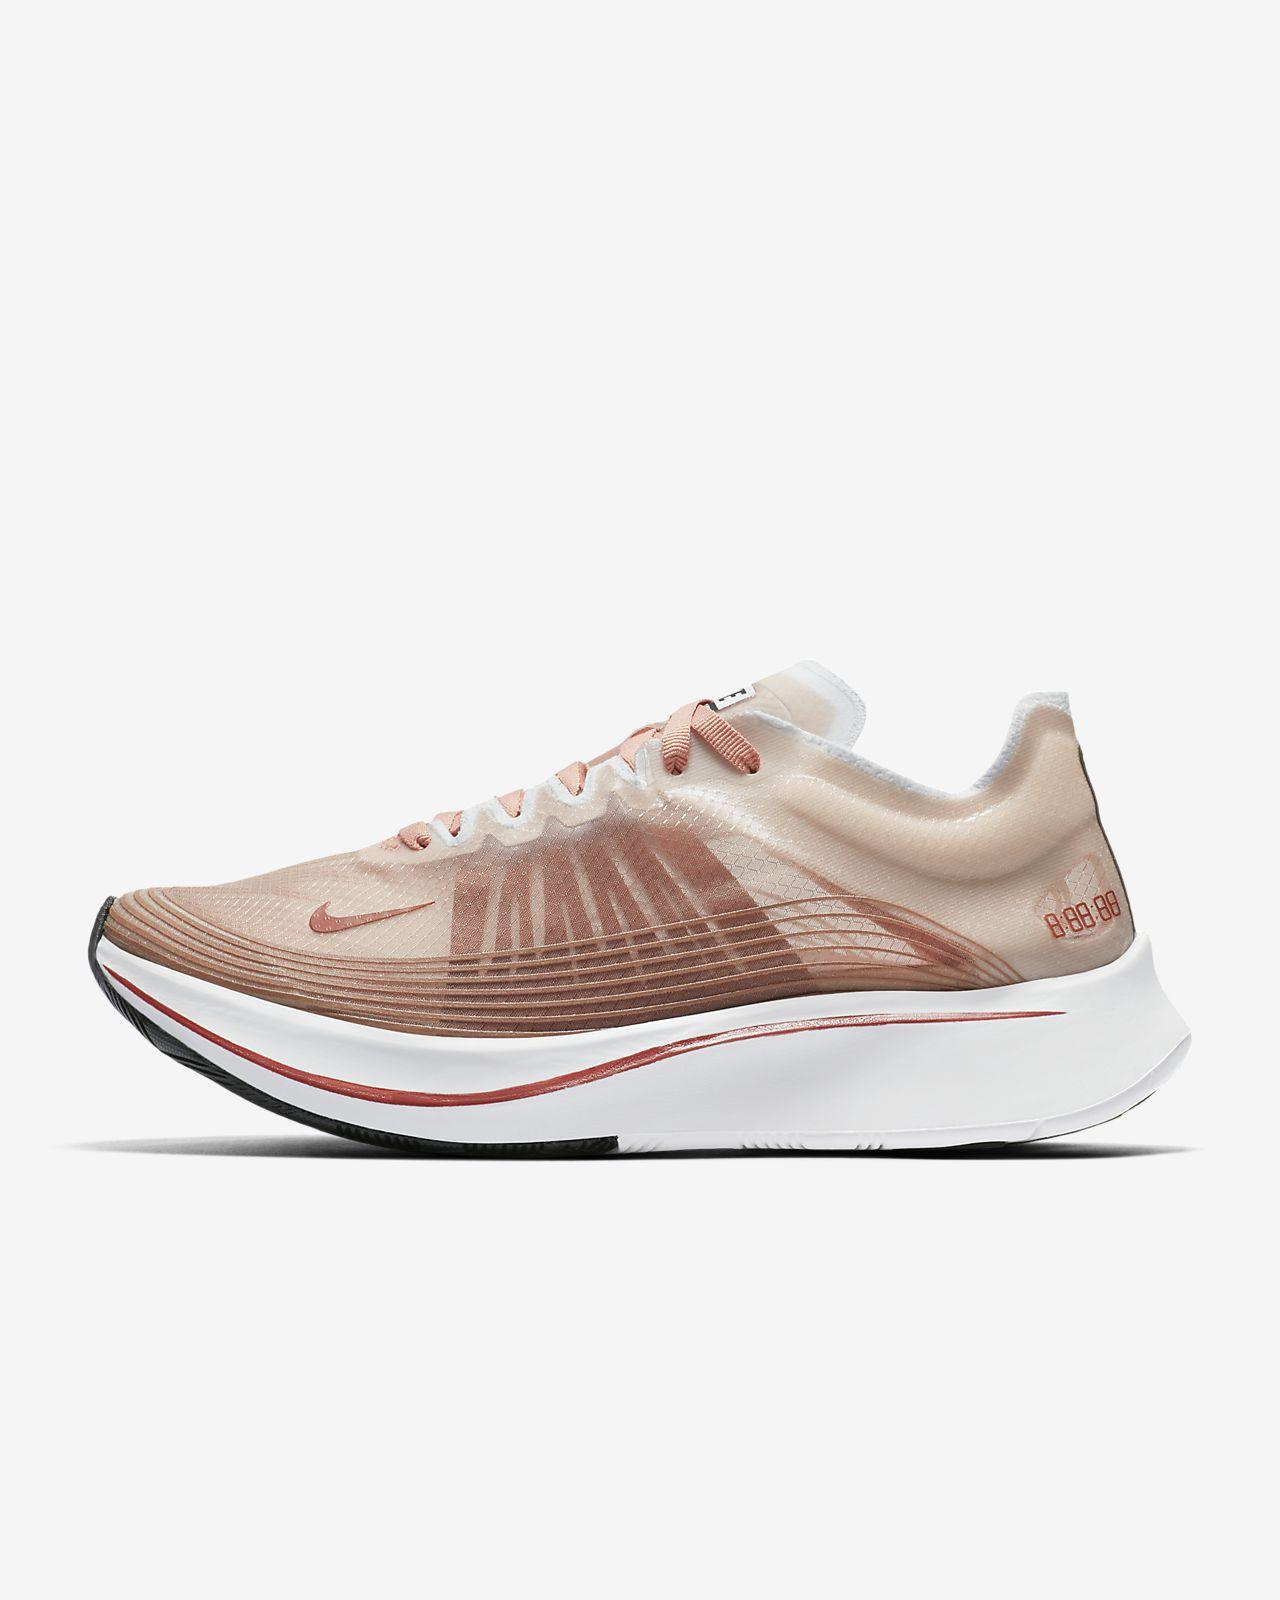 Nike Zoom Fly SP Damen Laufschuh